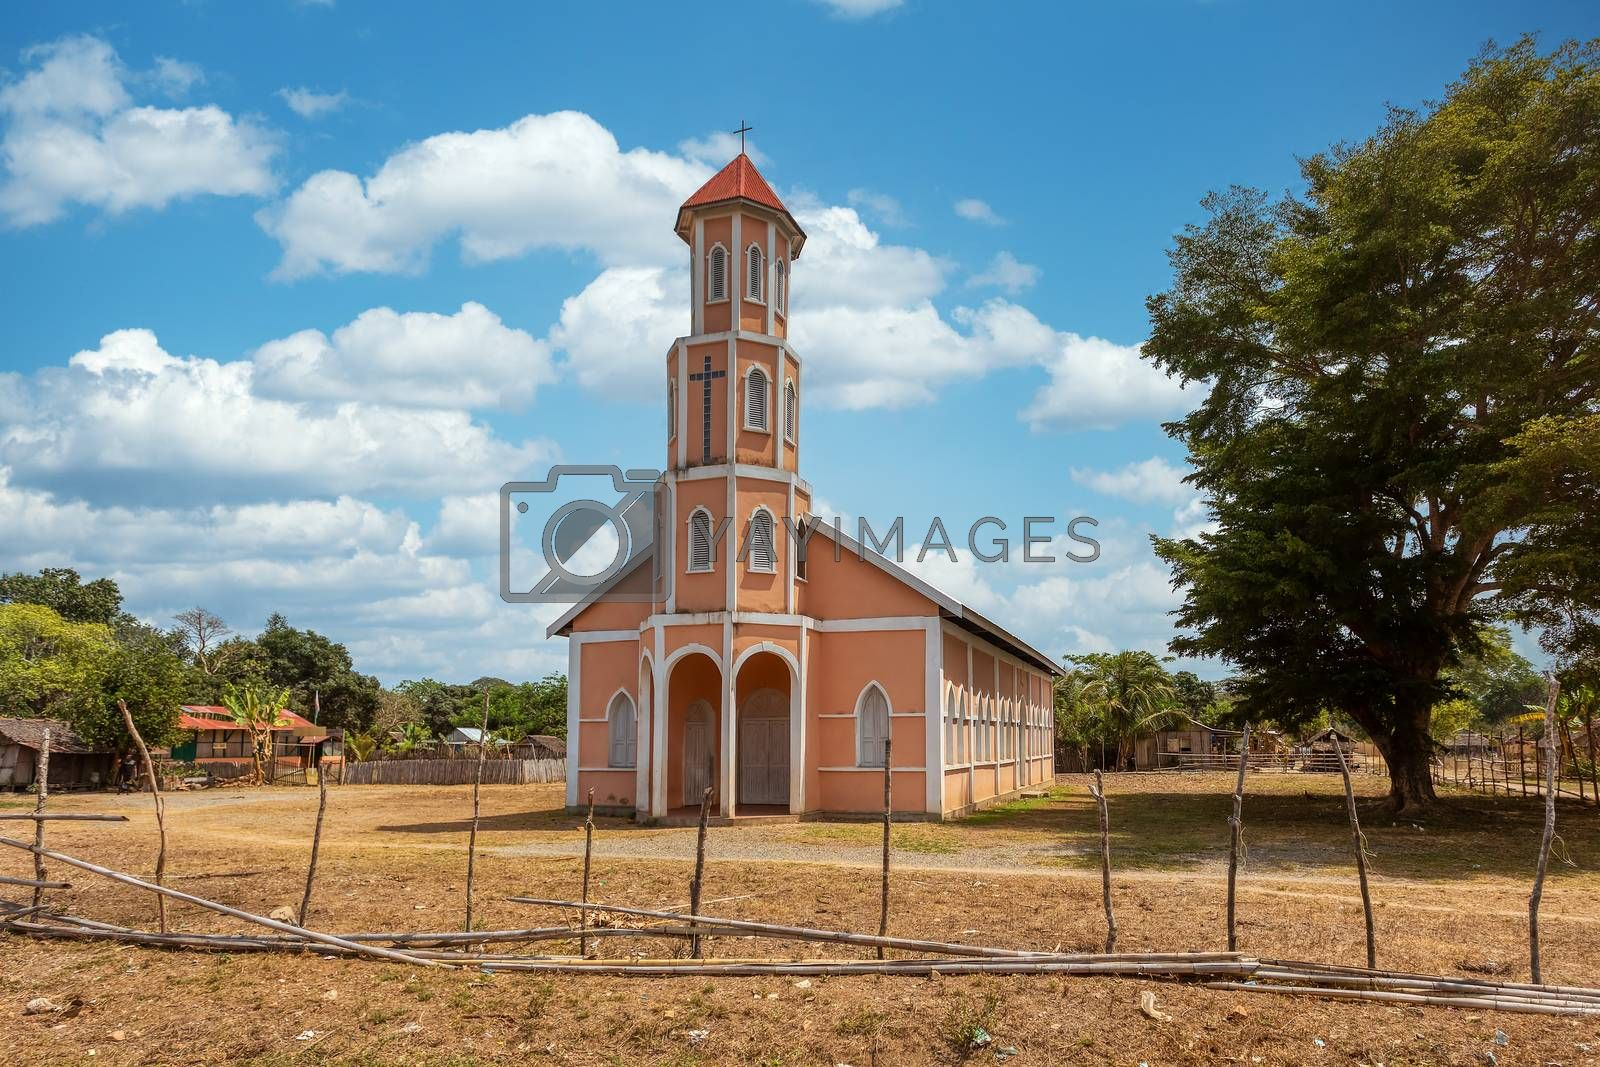 Small christian church in rural area, Madagascar countryside